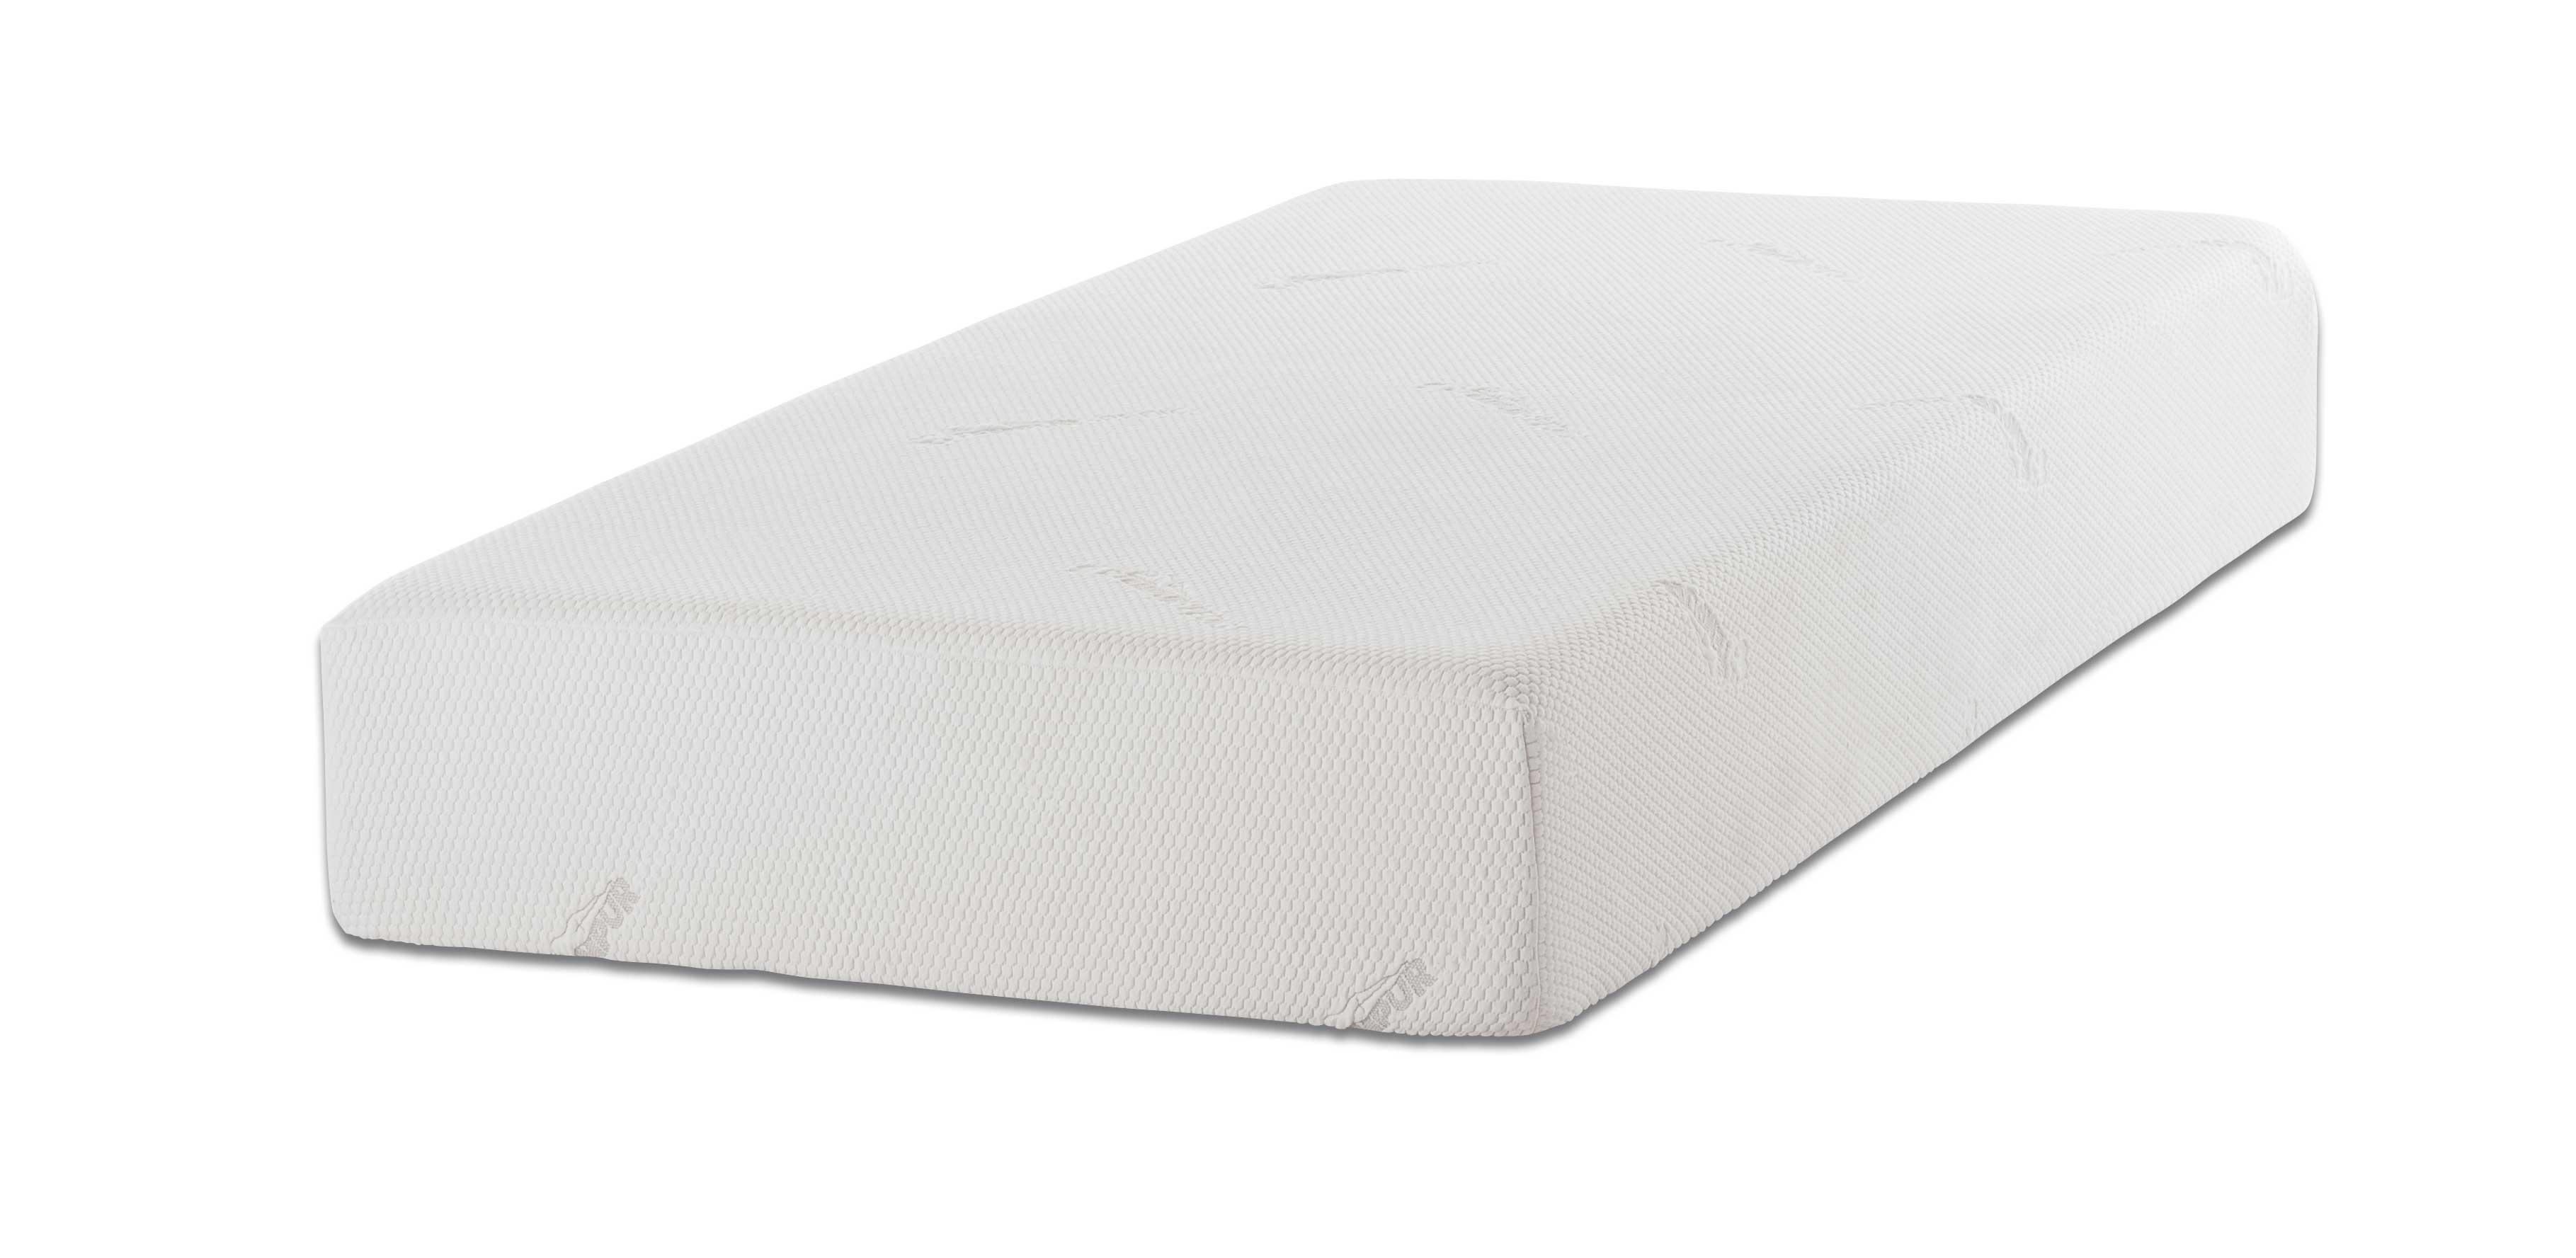 tempur madras AssistData   Sensation mattress from Tempur Sealy Danmark A/S  tempur madras